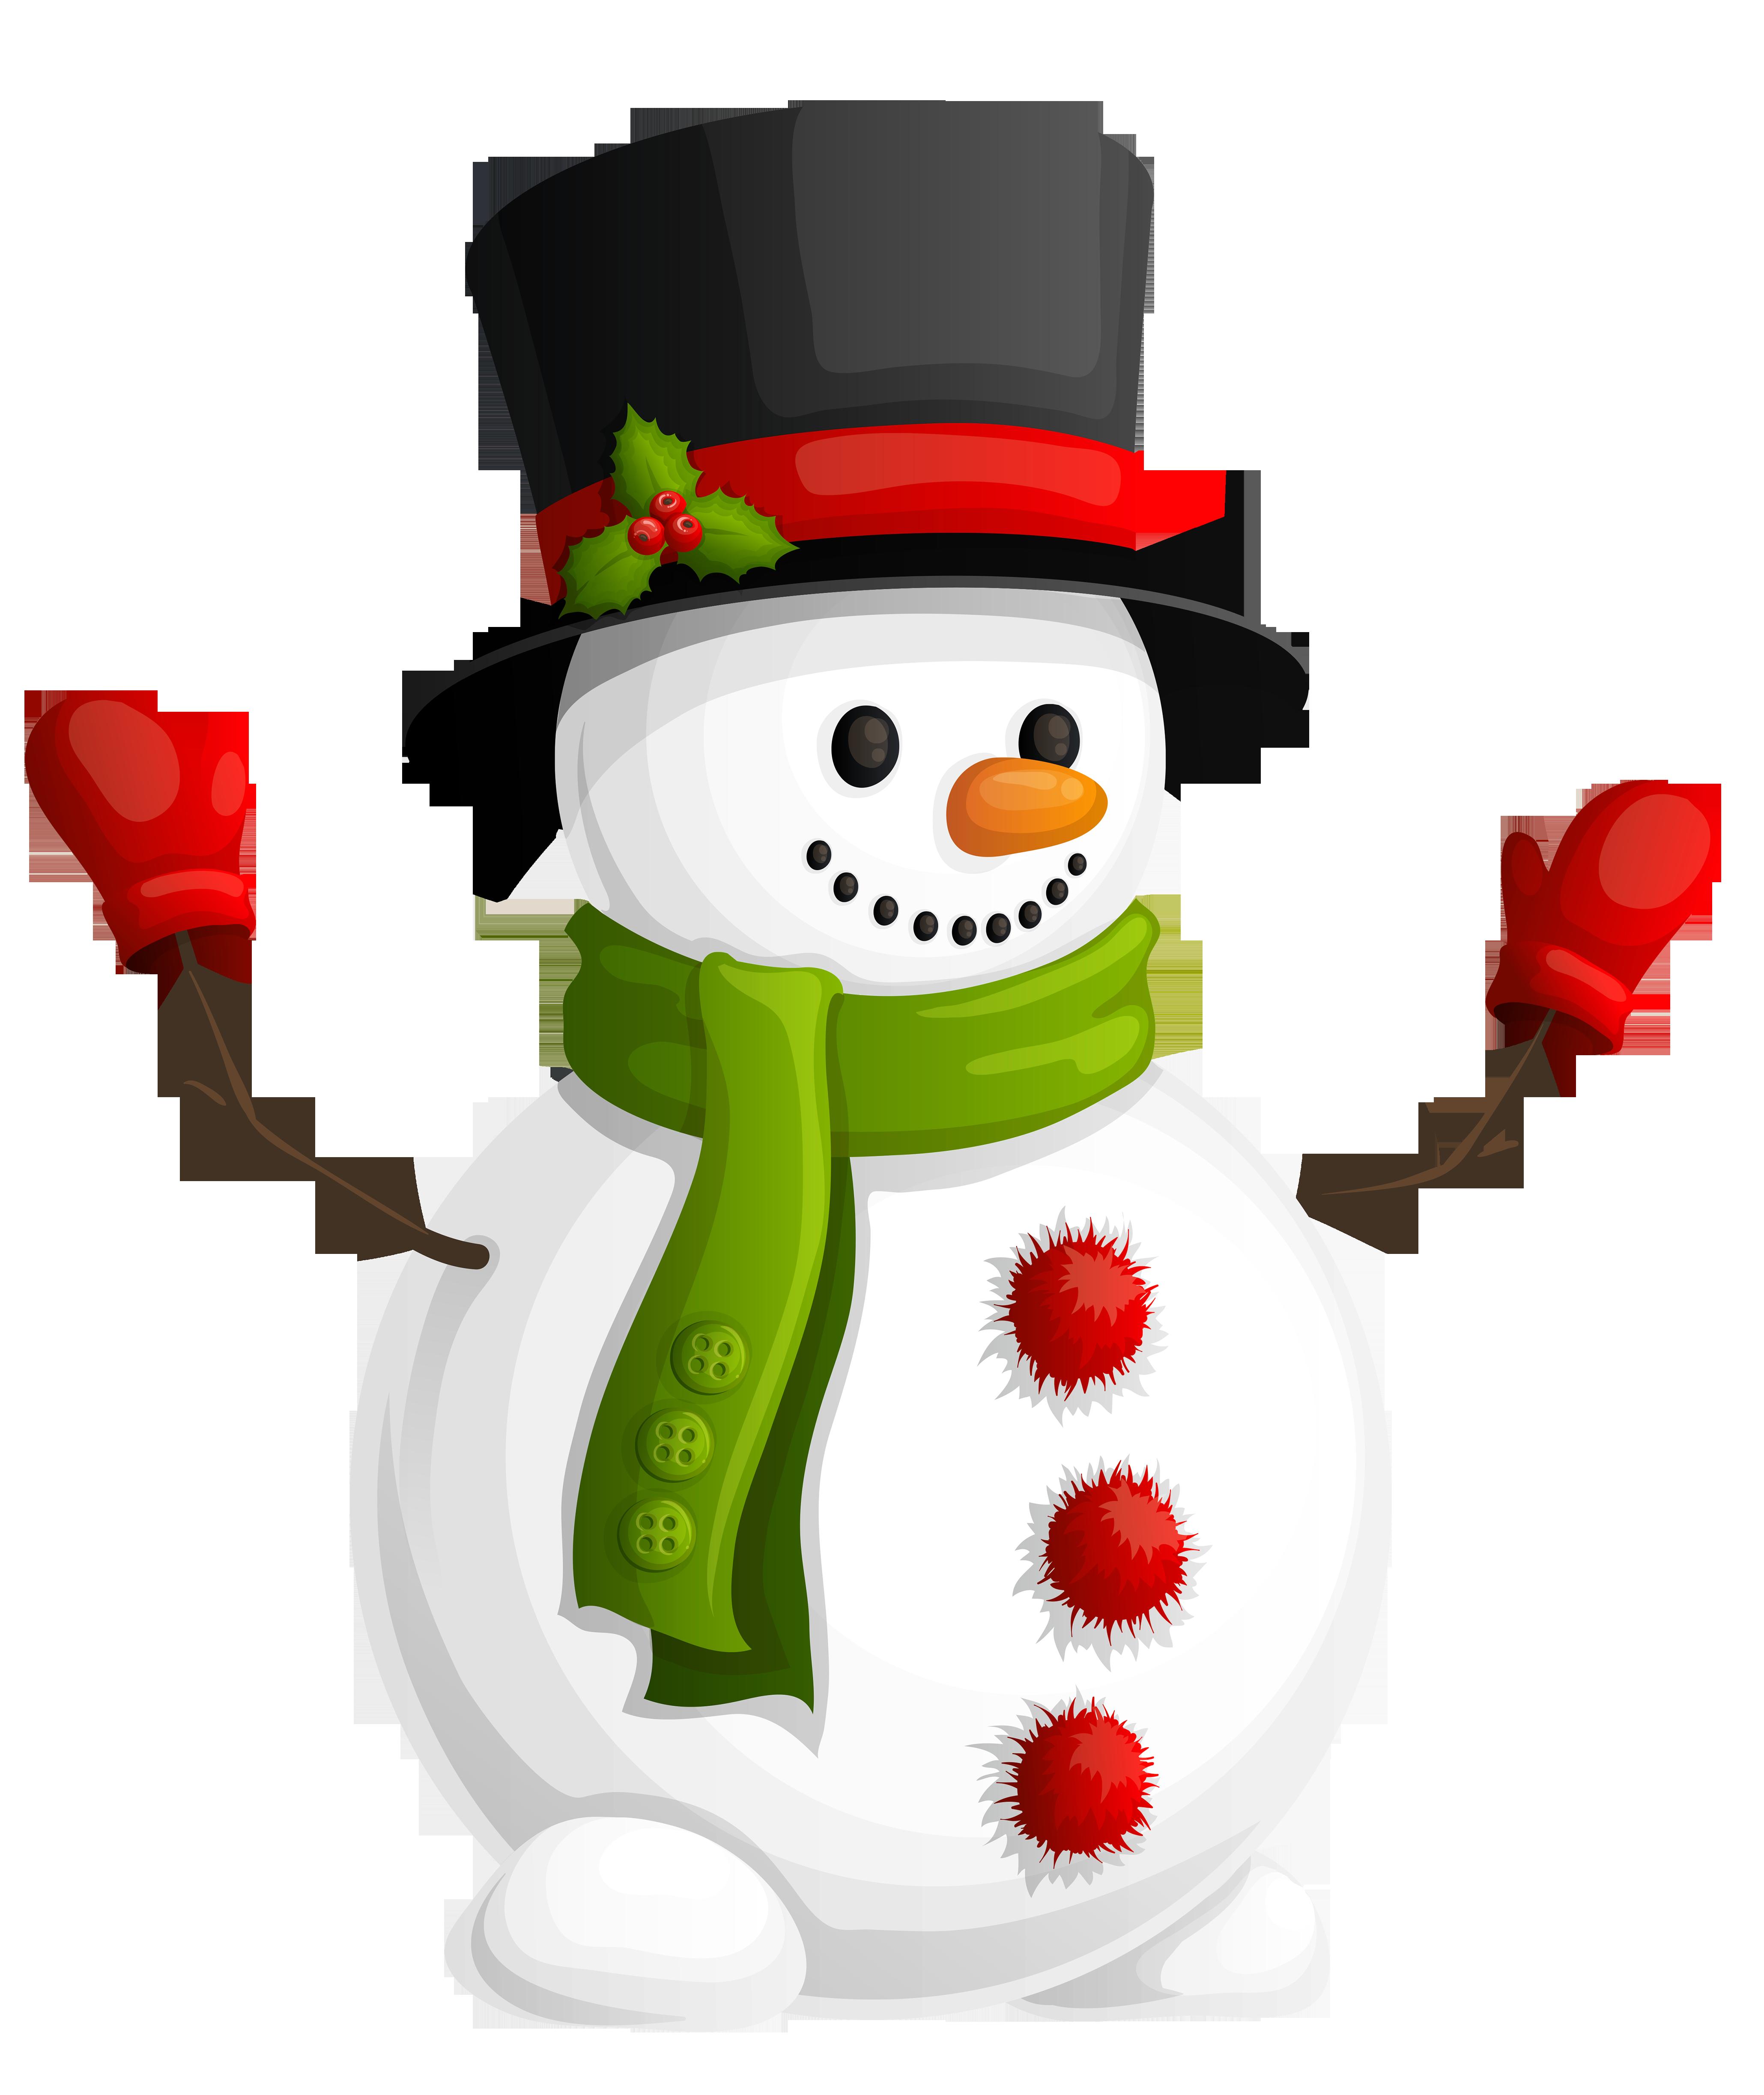 clipart christmas snowman at getdrawings com free for personal use rh getdrawings com snowman christmas tree clip art snowman christmas tree clip art